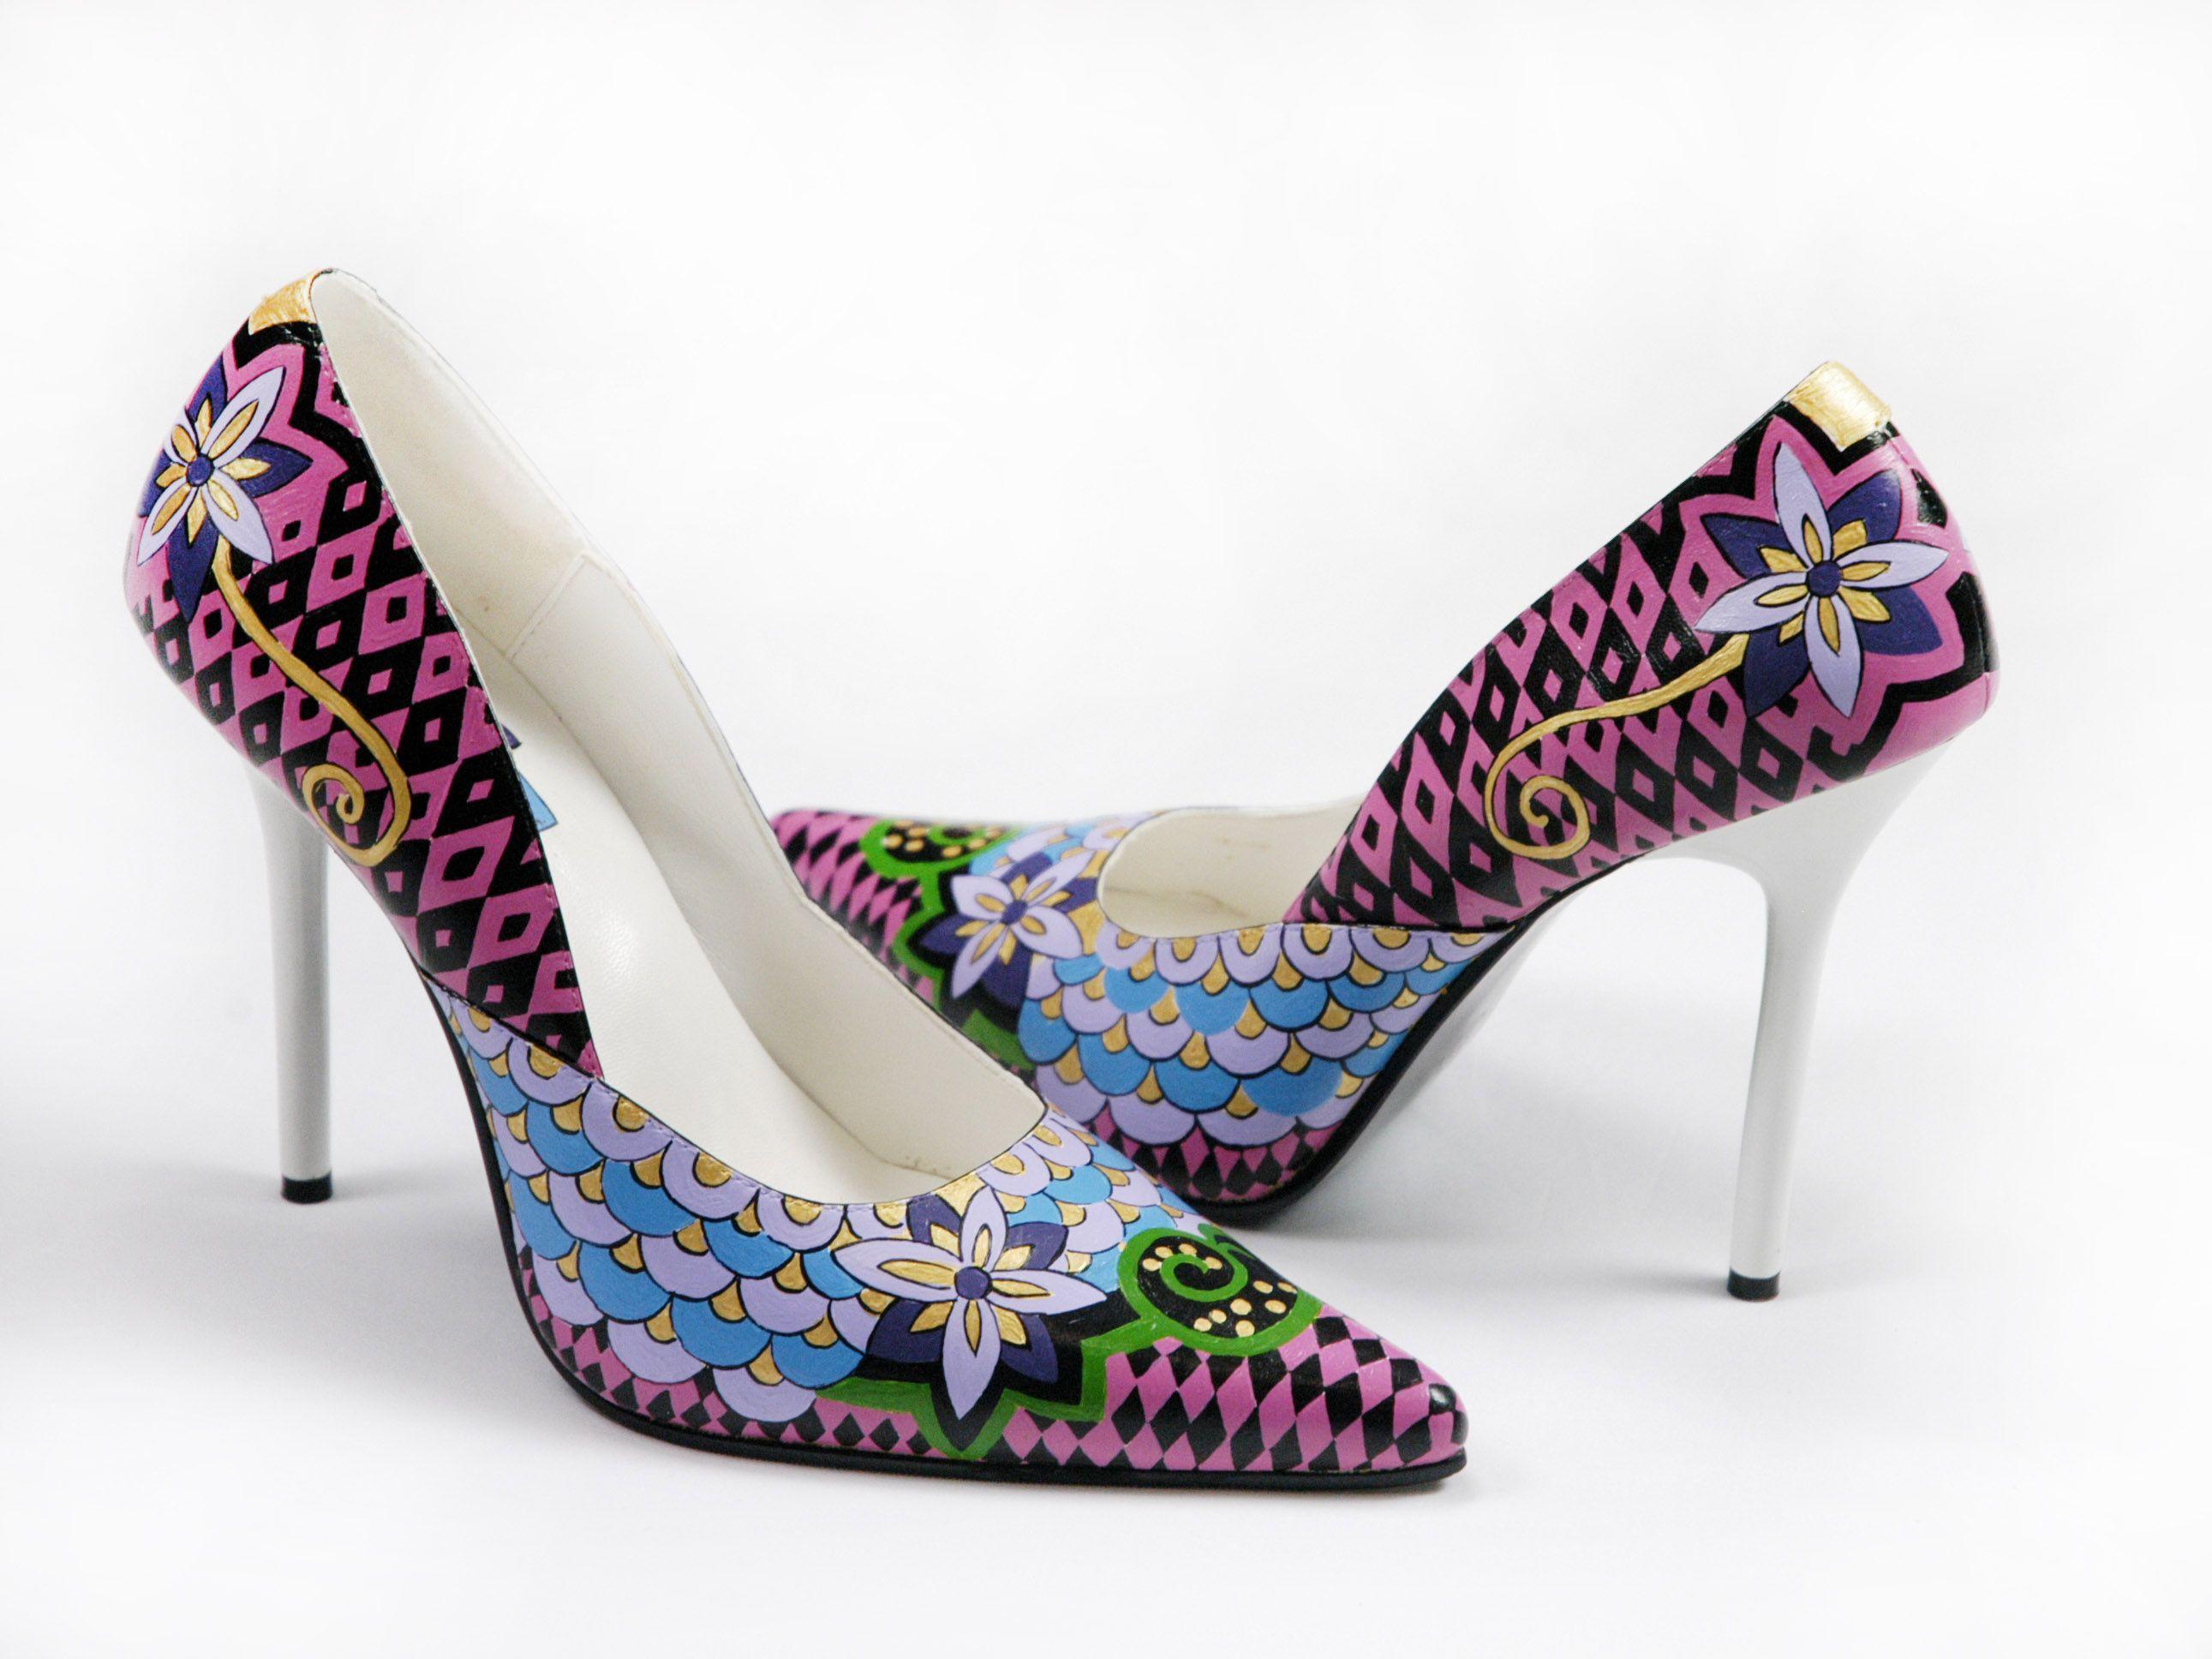 090927f5b8626b Hand+Painted+Leather+Pumps Geometric-Flower+inspiration! Maripe+Shoes